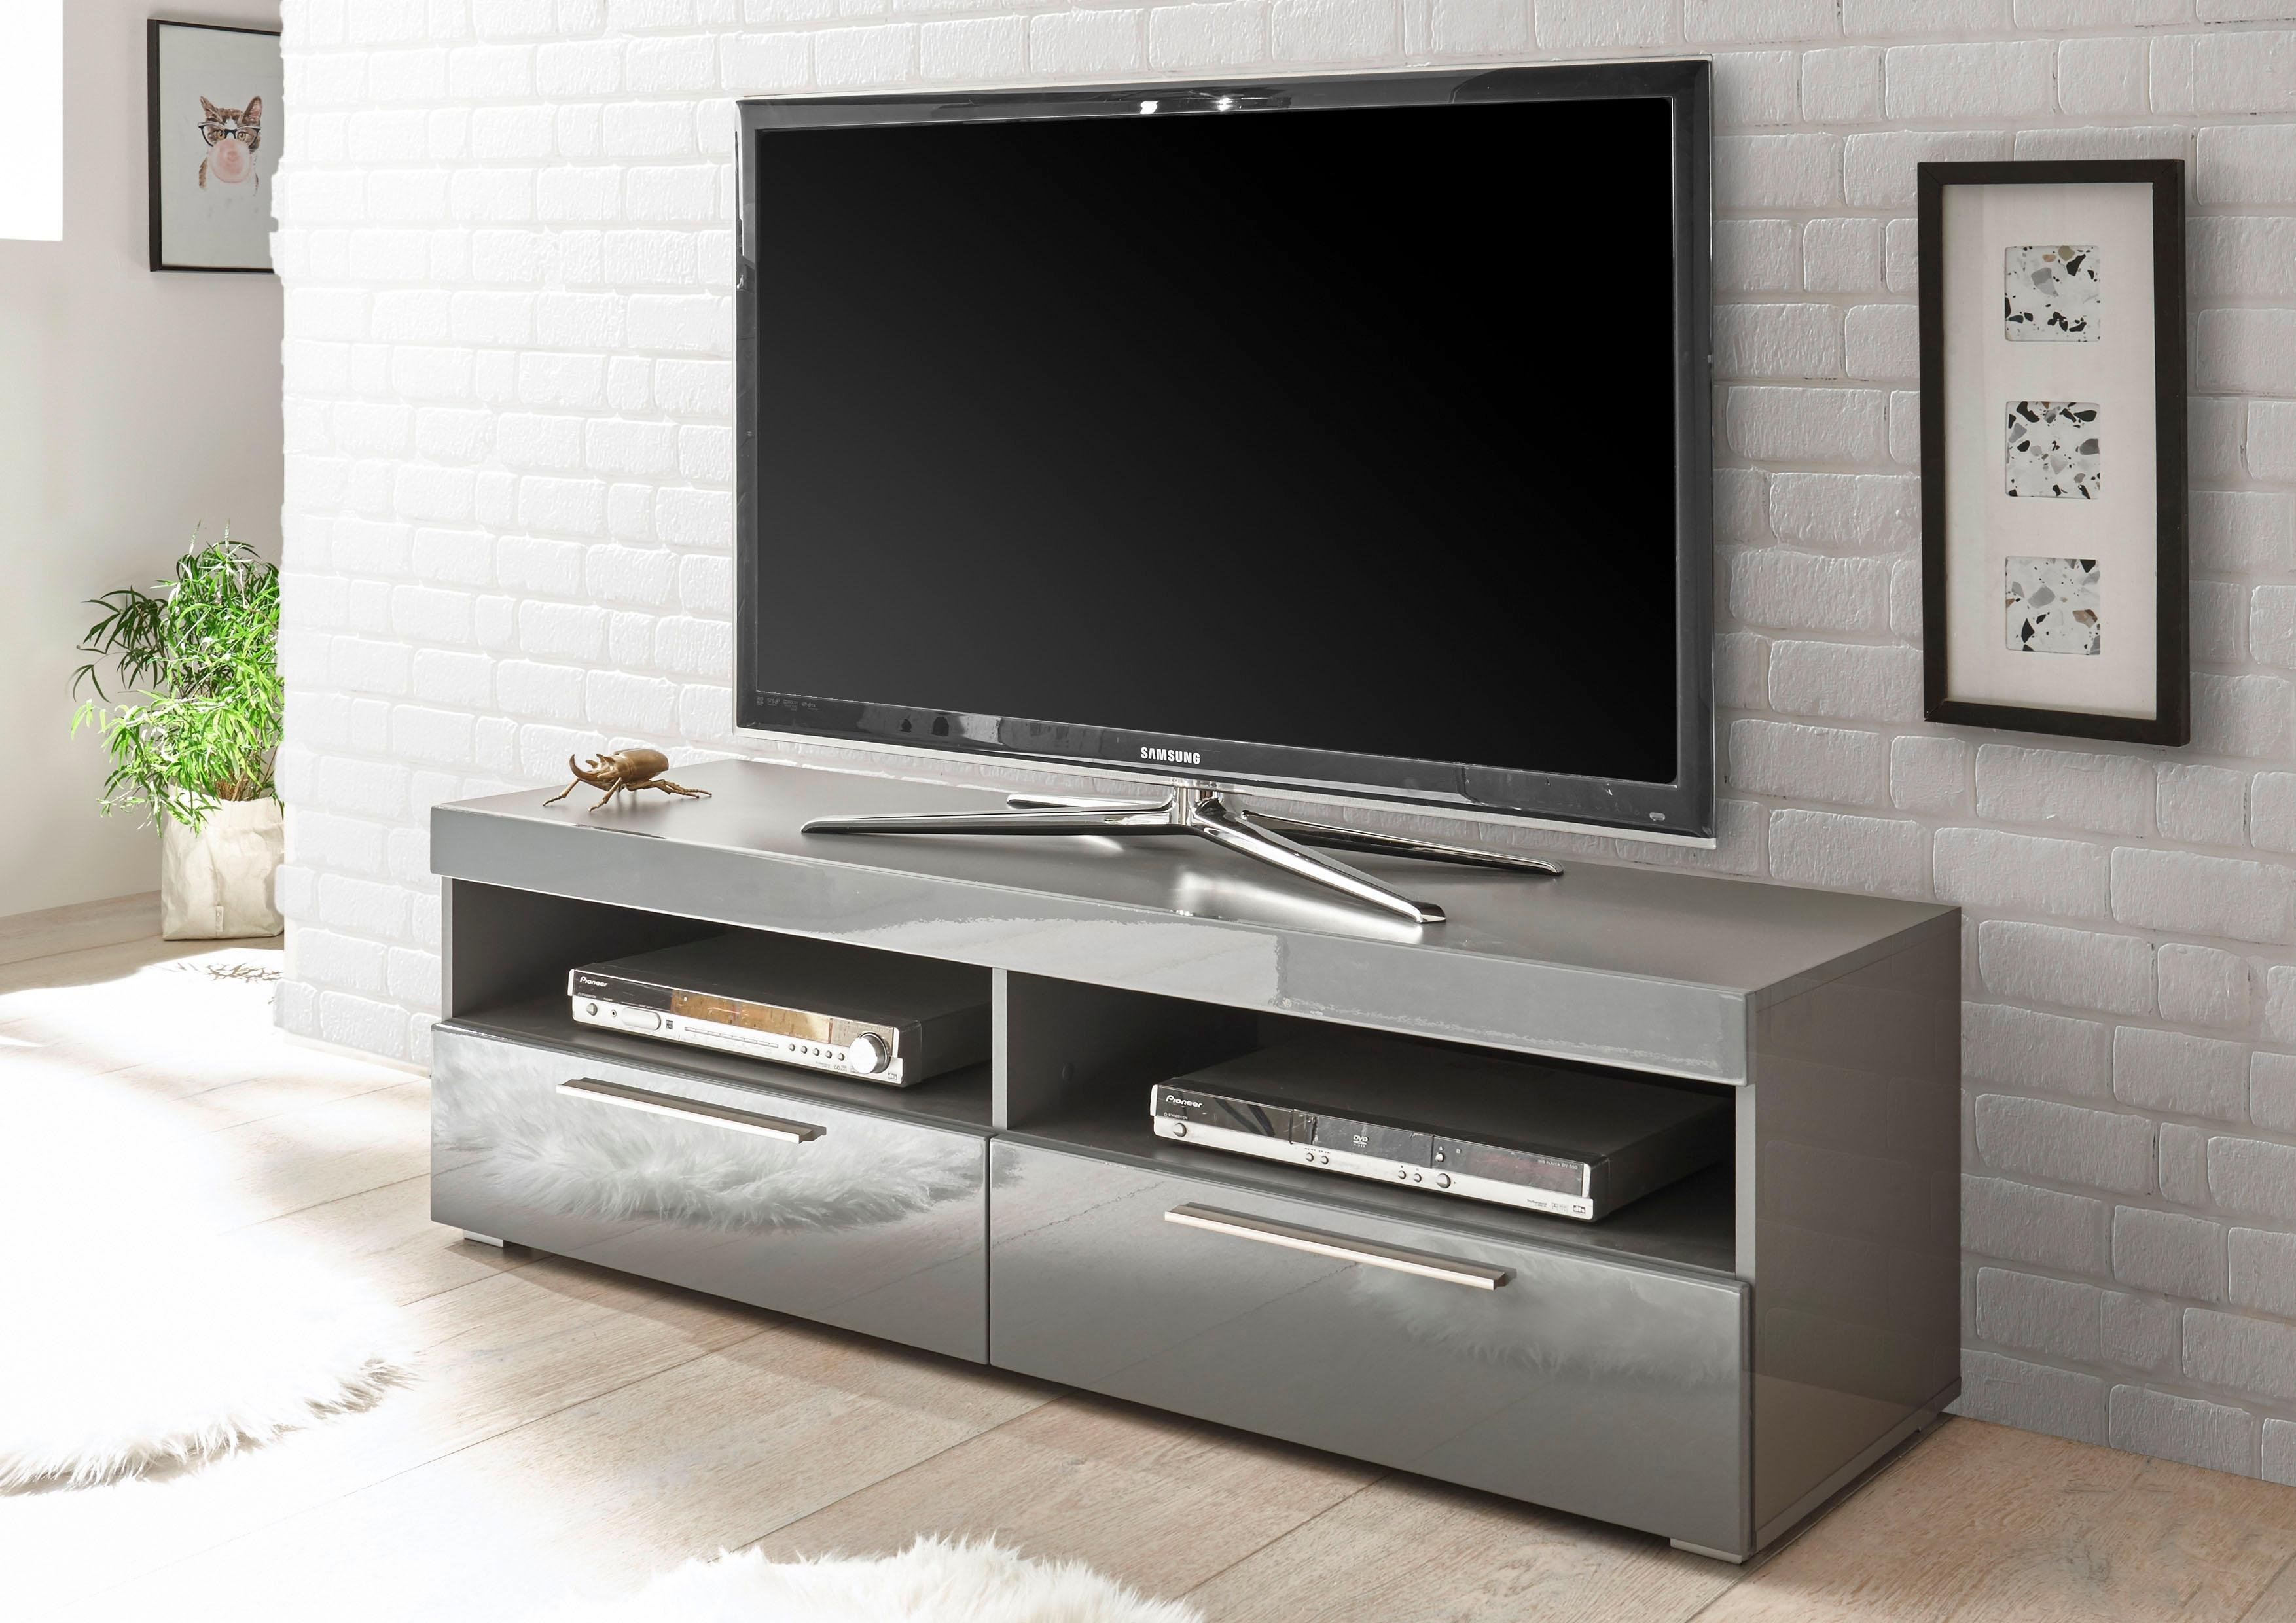 Bruno Banani tv-meubel »GOBA« - verschillende betaalmethodes